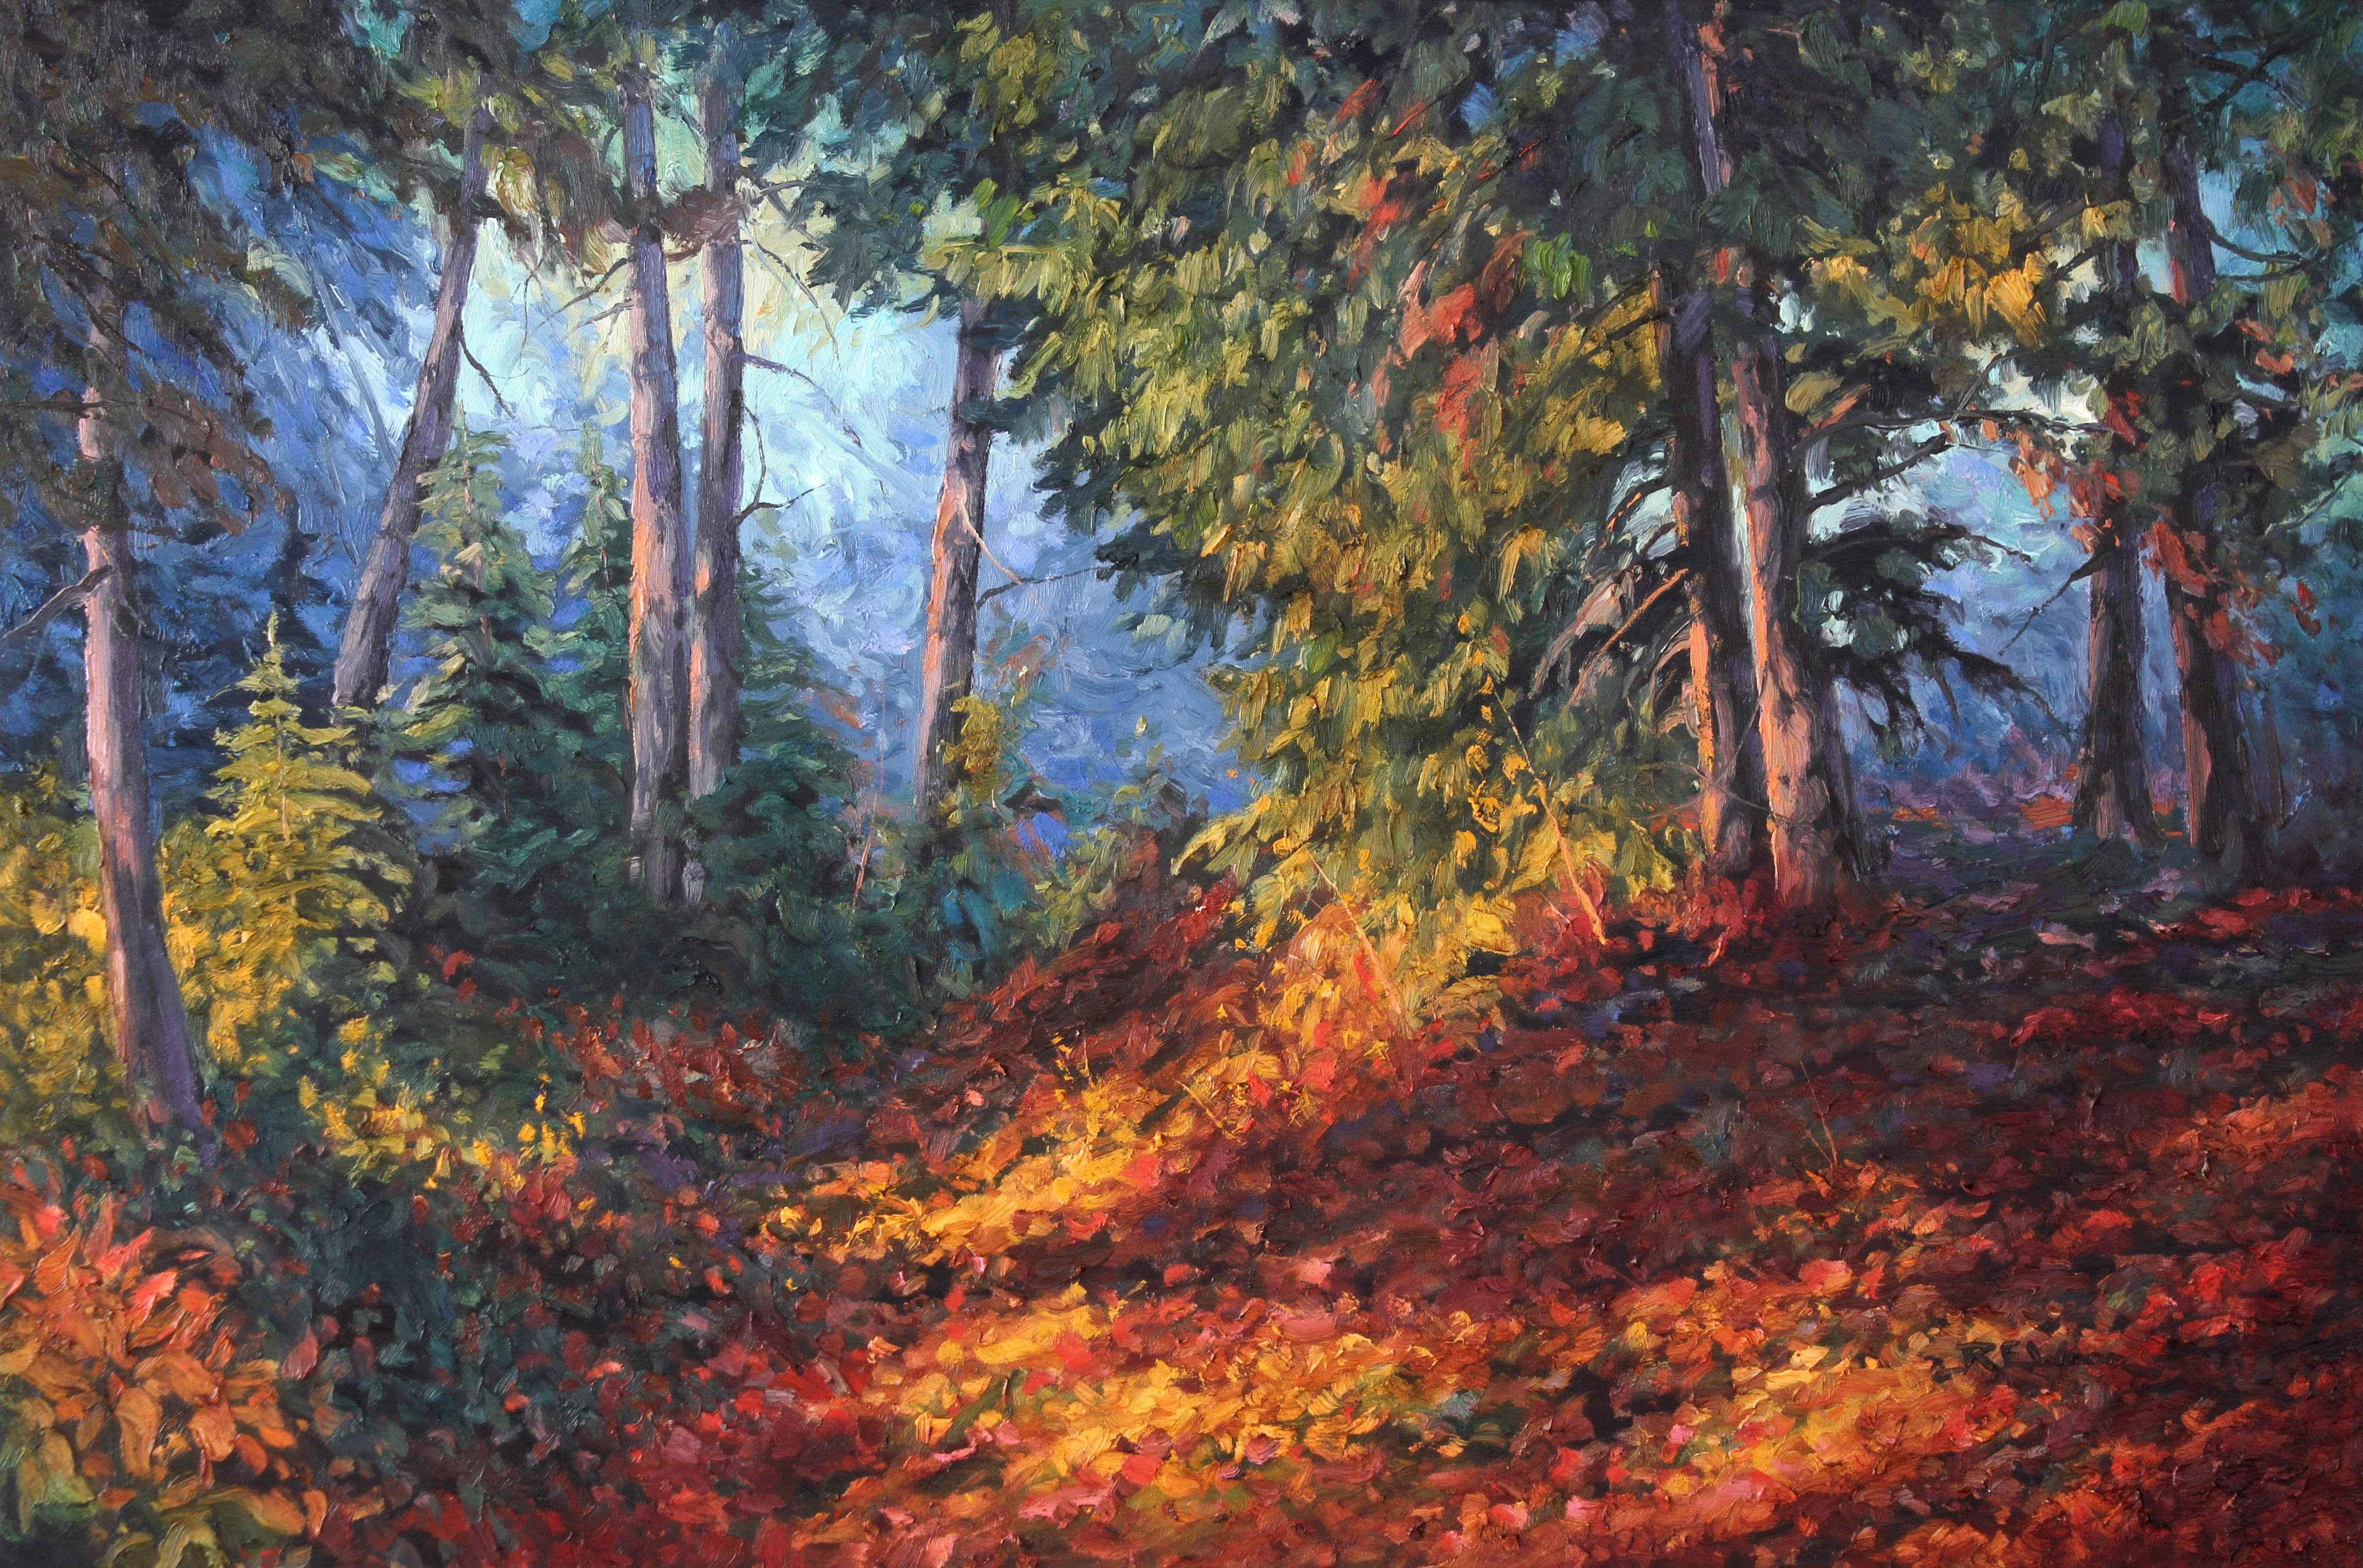 Forest Mist by  Robert E. Wood - Masterpiece Online